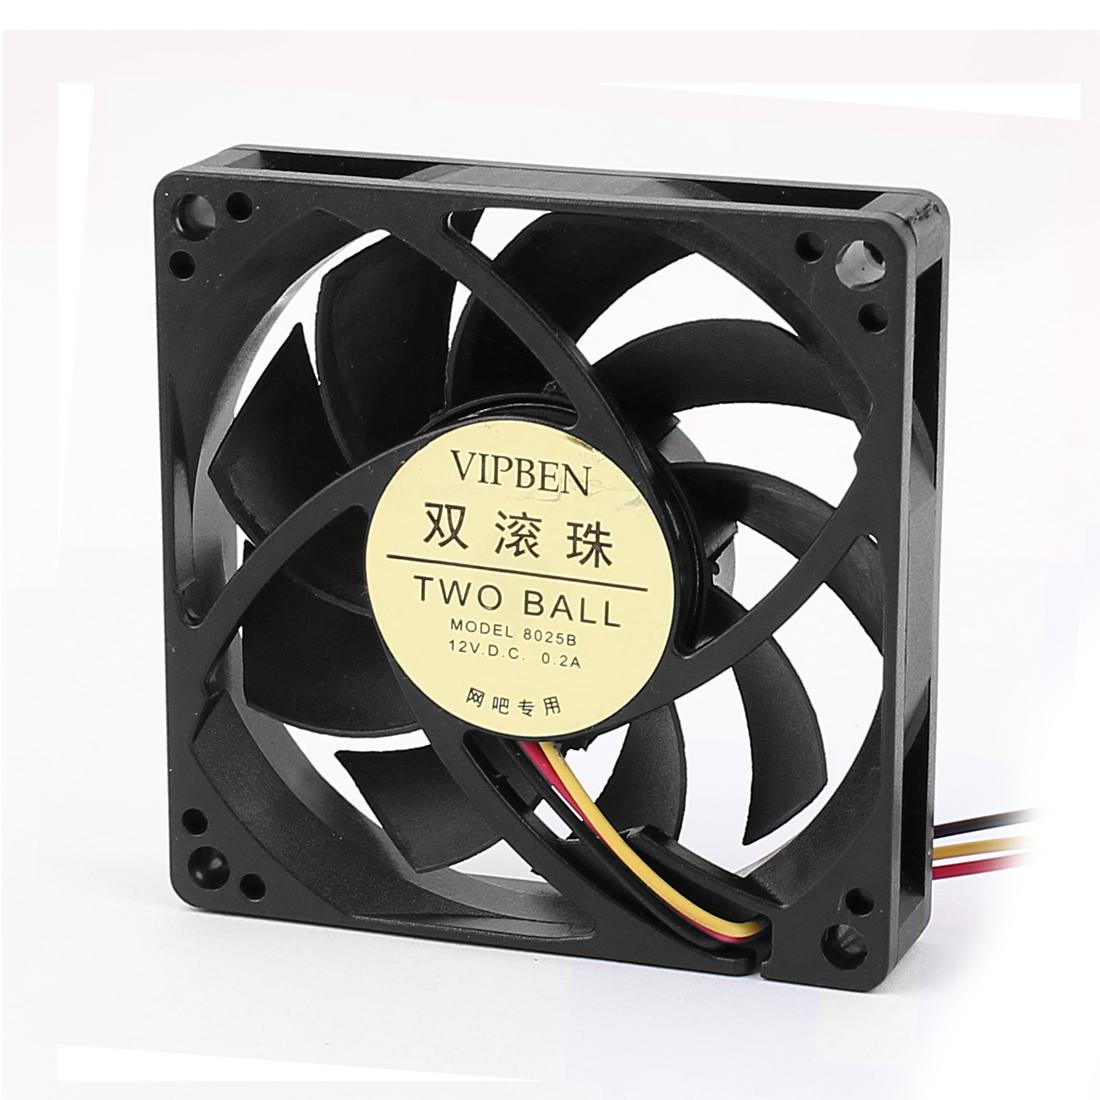 DC 12V 0.2A Computer Case Ball Bearing Motor Internal CPU Cooling Fan Cooler Black